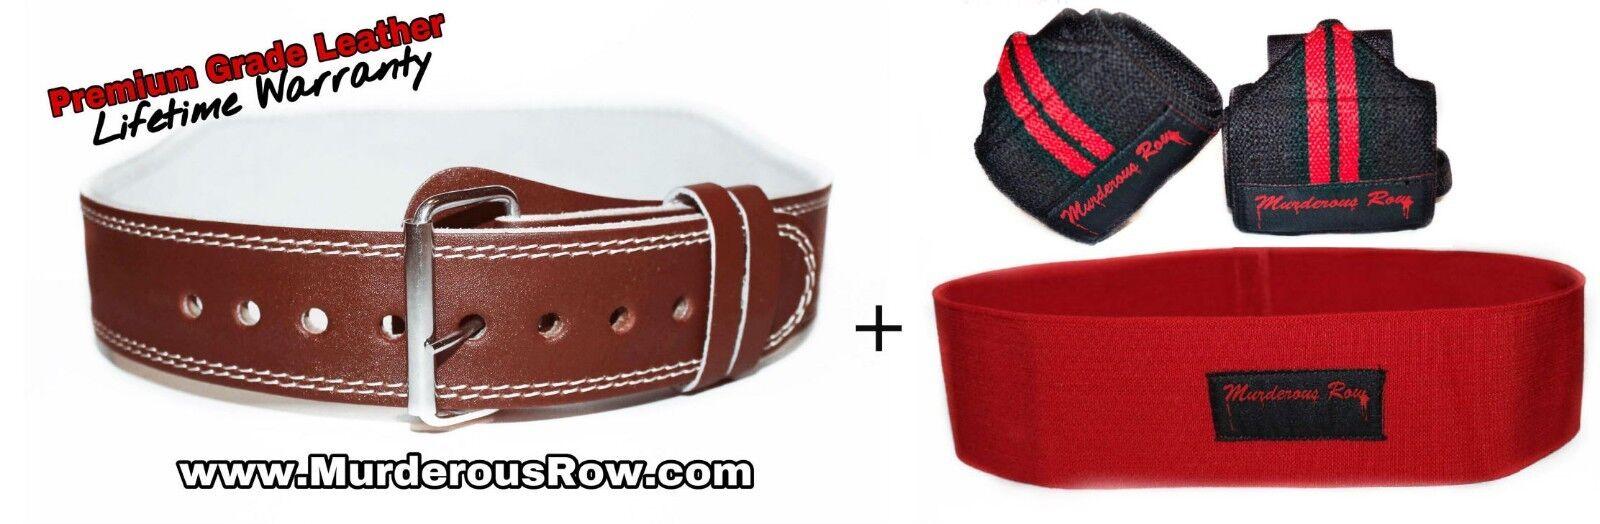 Murderous Row Powerlifting Belt (M) +  Hip Circle + Wrist Wraps -INSANE SQUAT SET  free shipping on all orders